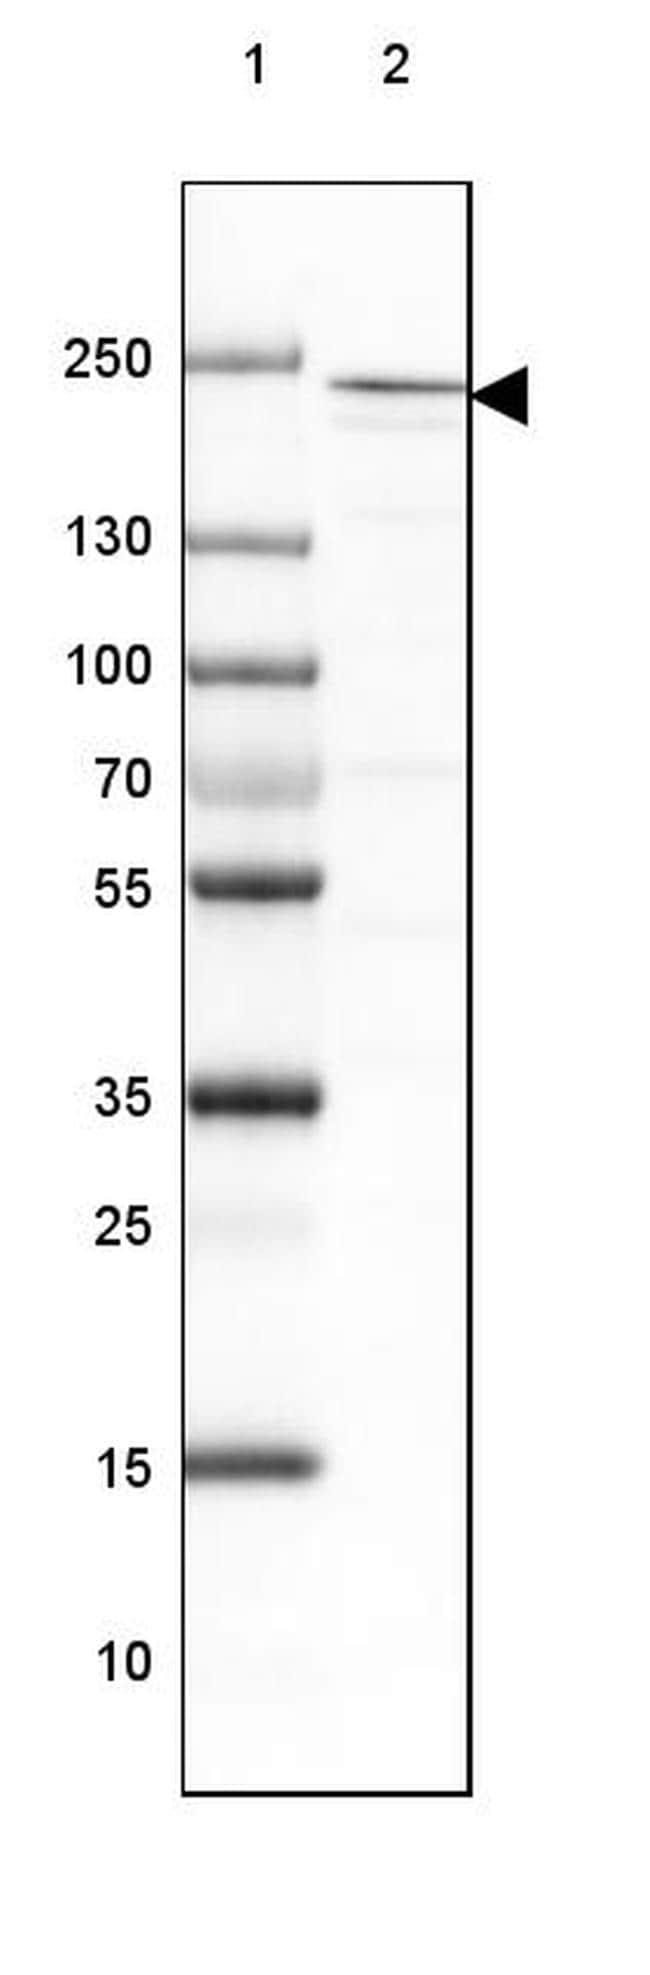 DOCK2 Antibody in Western Blot (WB)